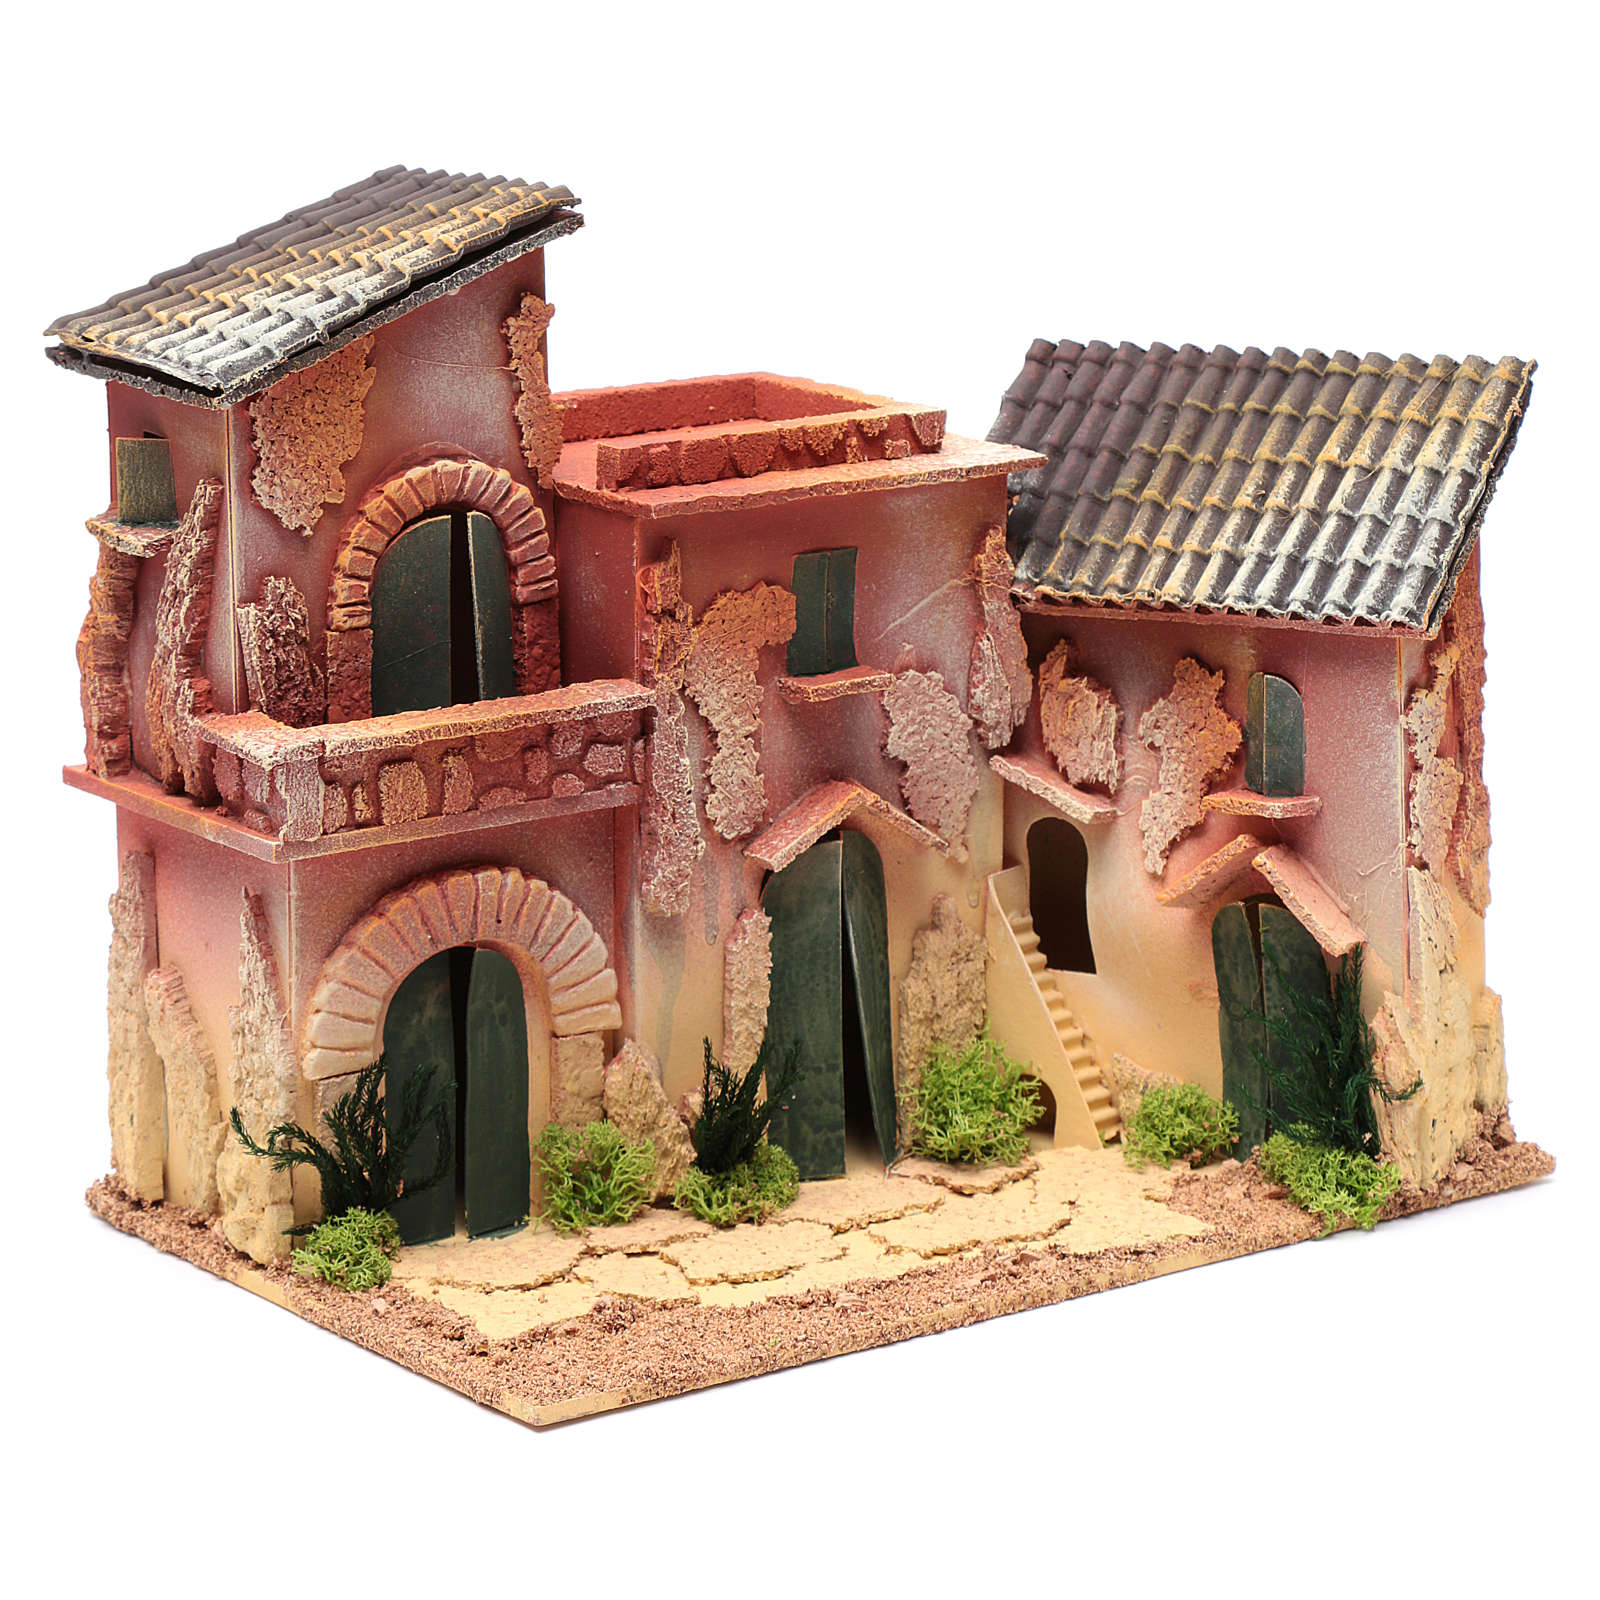 Nativity scene village 25x30x20 cm 4